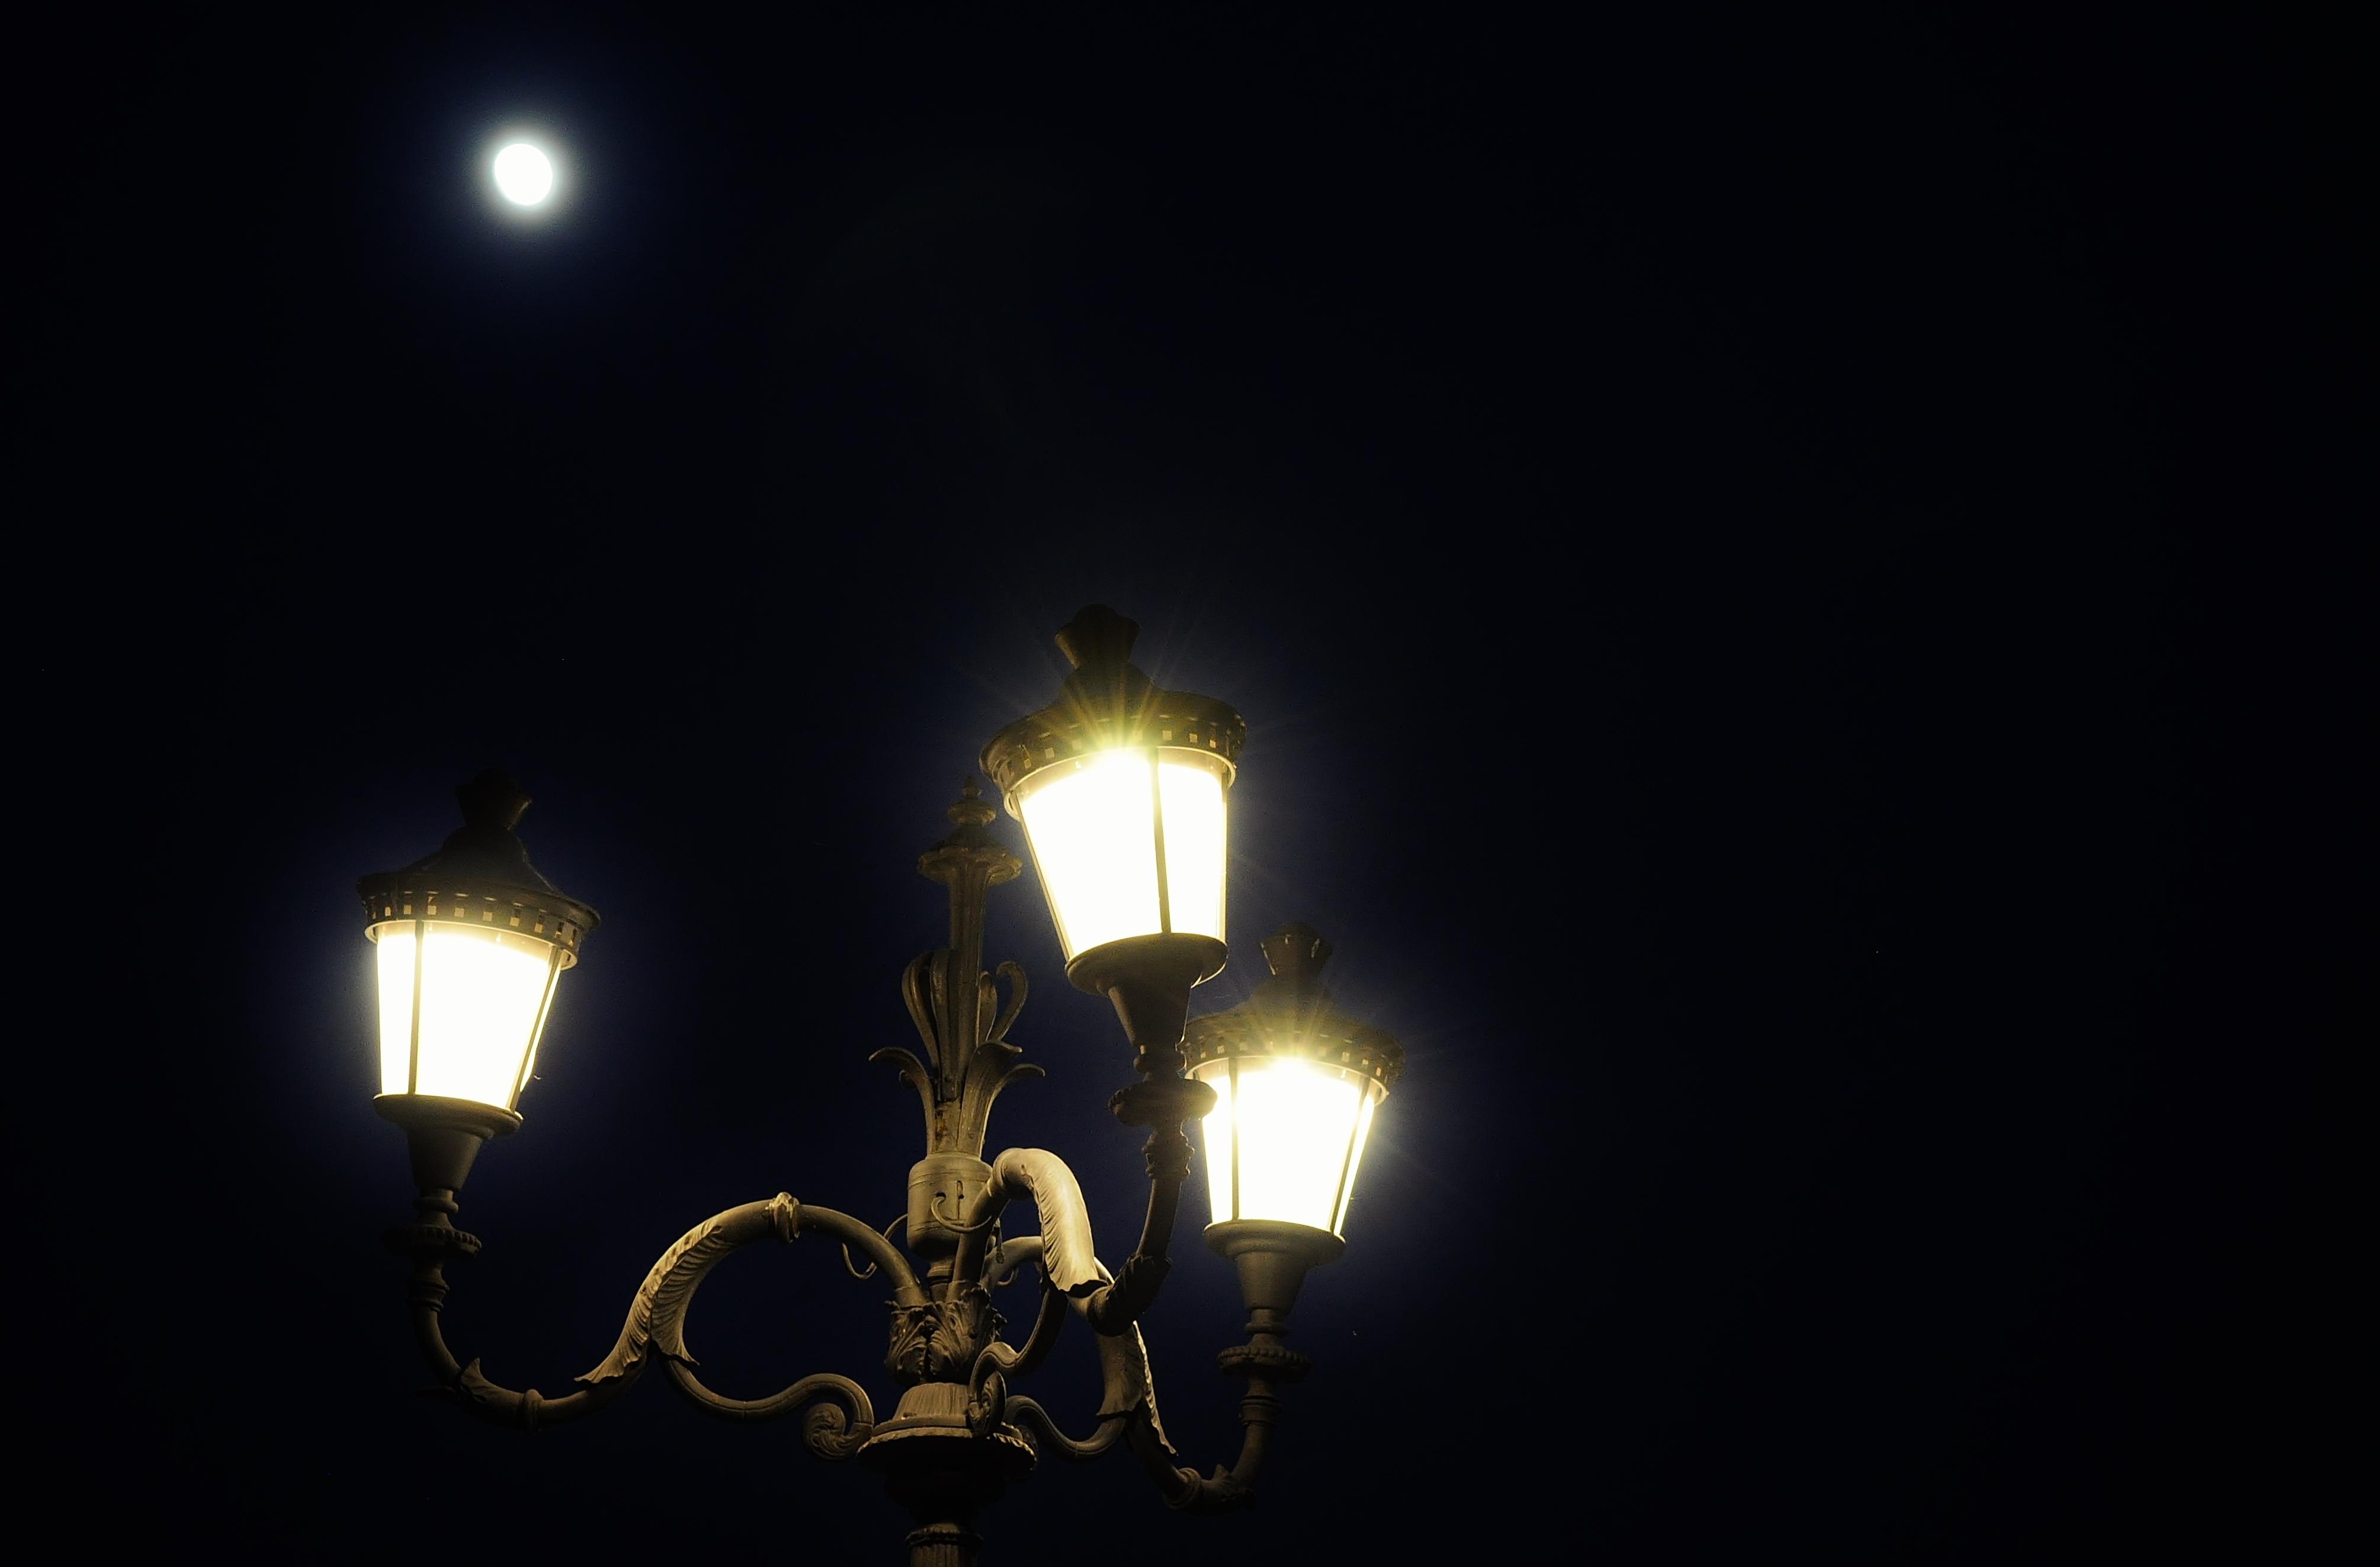 Free images night sparkler lantern romantic darkness street light night sparkler lantern romantic darkness street light lighting full moon lights lamppost lunar light fixture arubaitofo Gallery